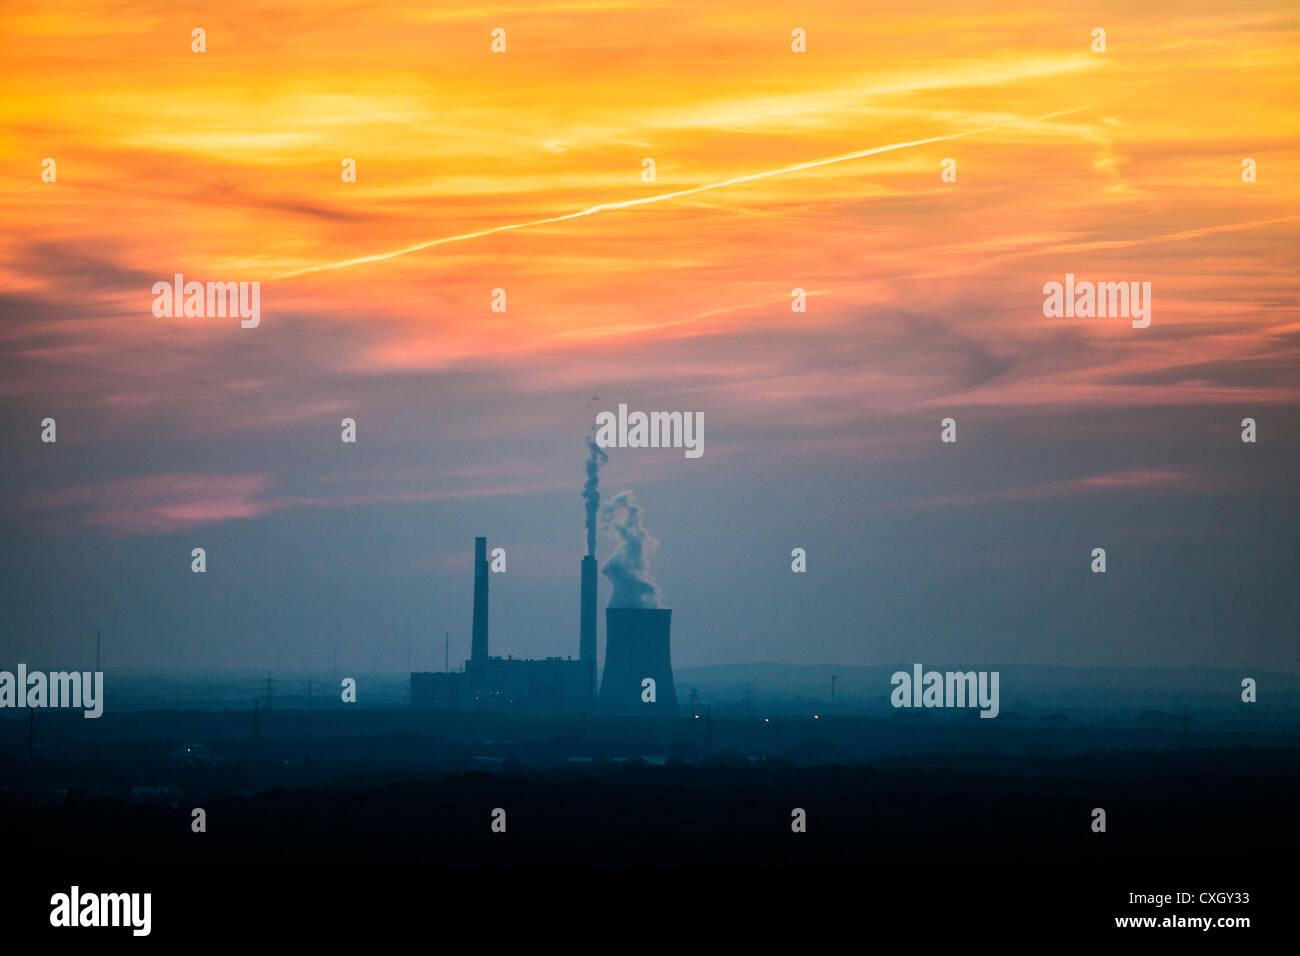 Sunset at STEAG coal power plant Voerde. 2157 megawatts. Niederrhein Voerde, NRW, Germany, Europe. - Stock Image